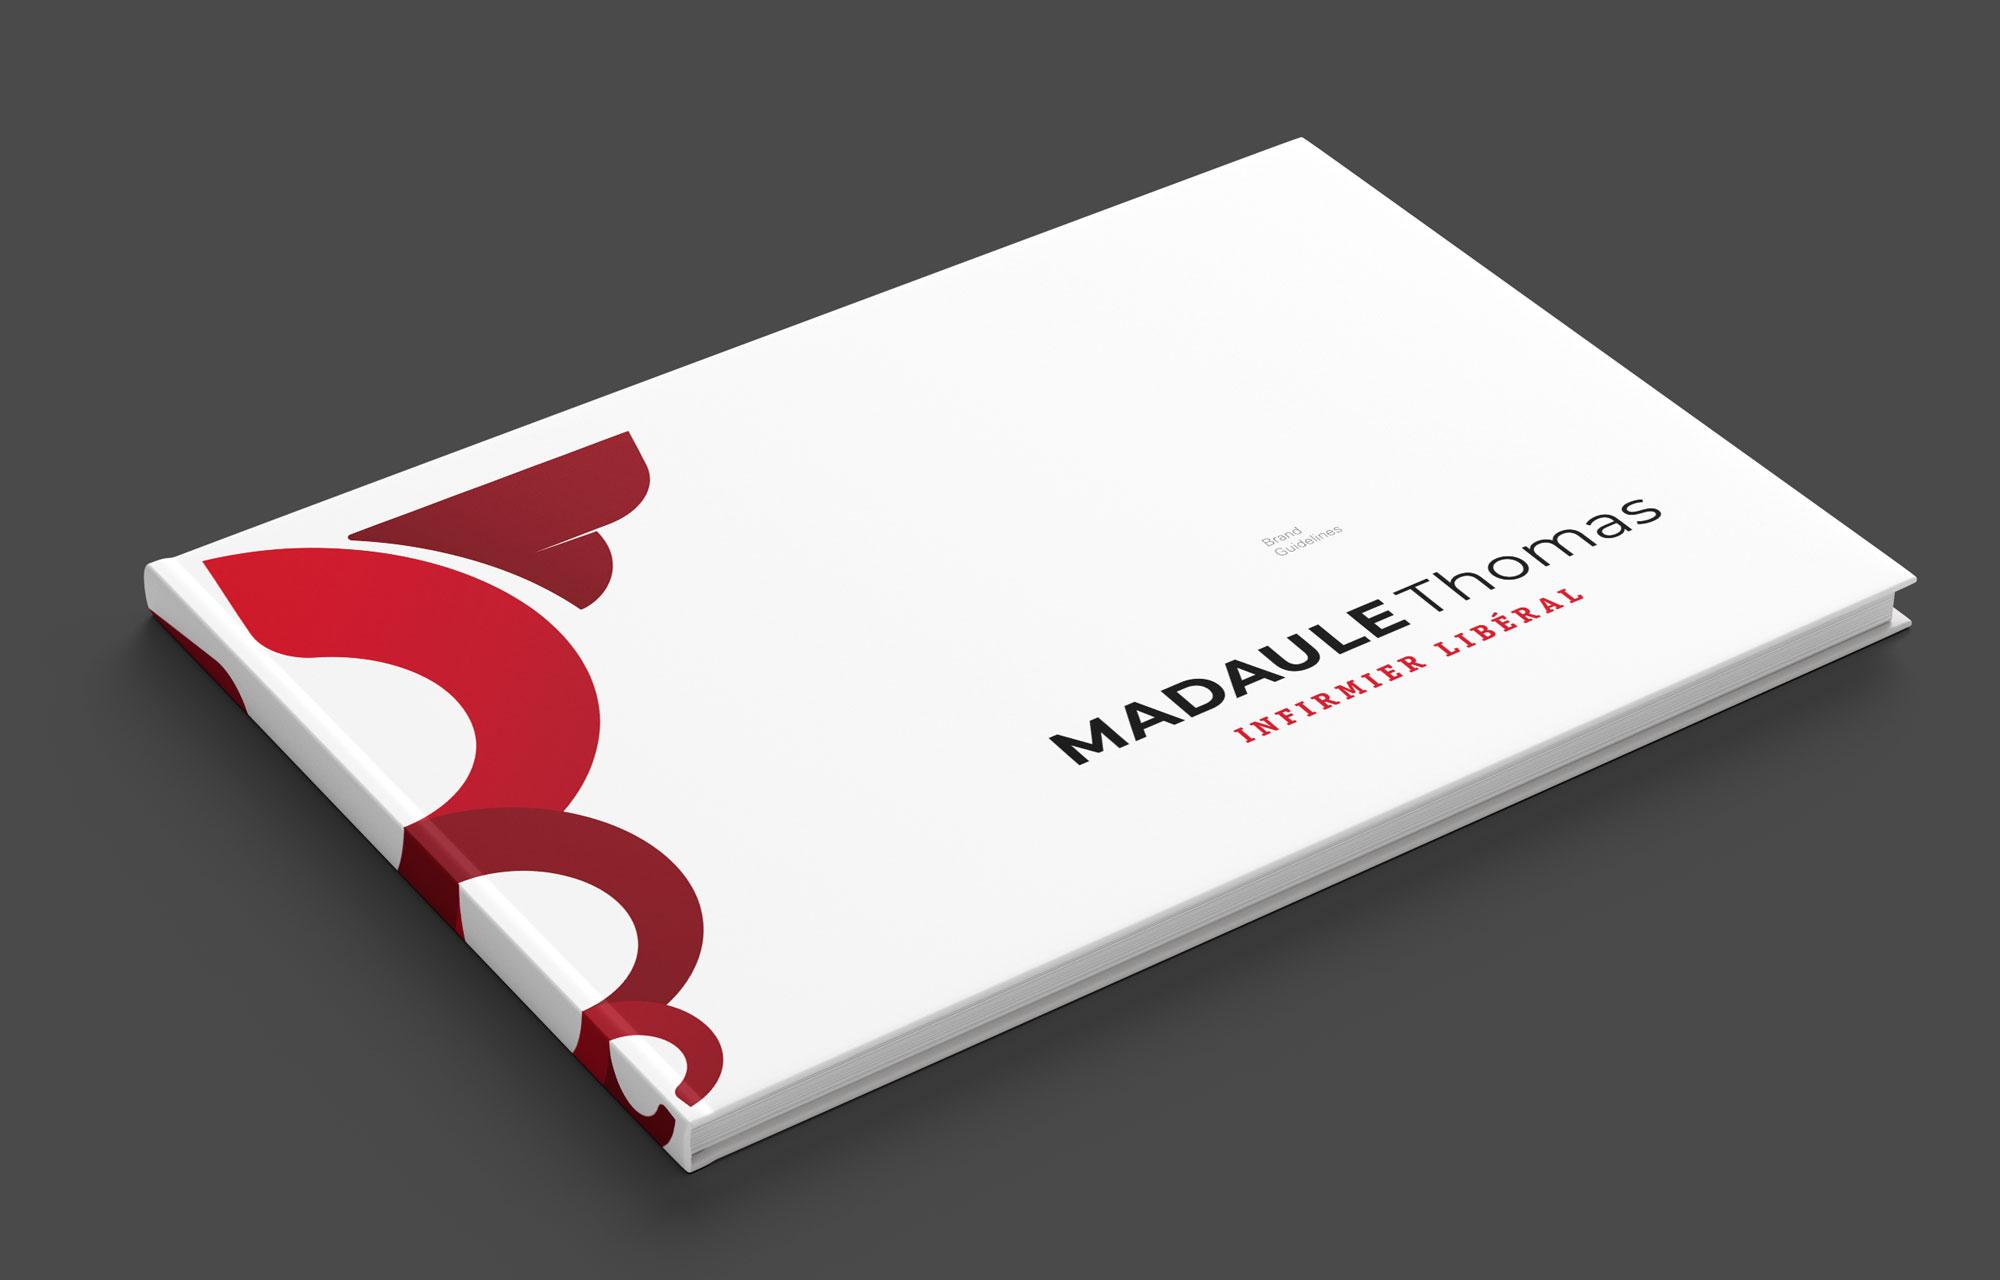 Madaule Thomas. Infirmier Libéral. Brand Guidelines. Frame Girona.